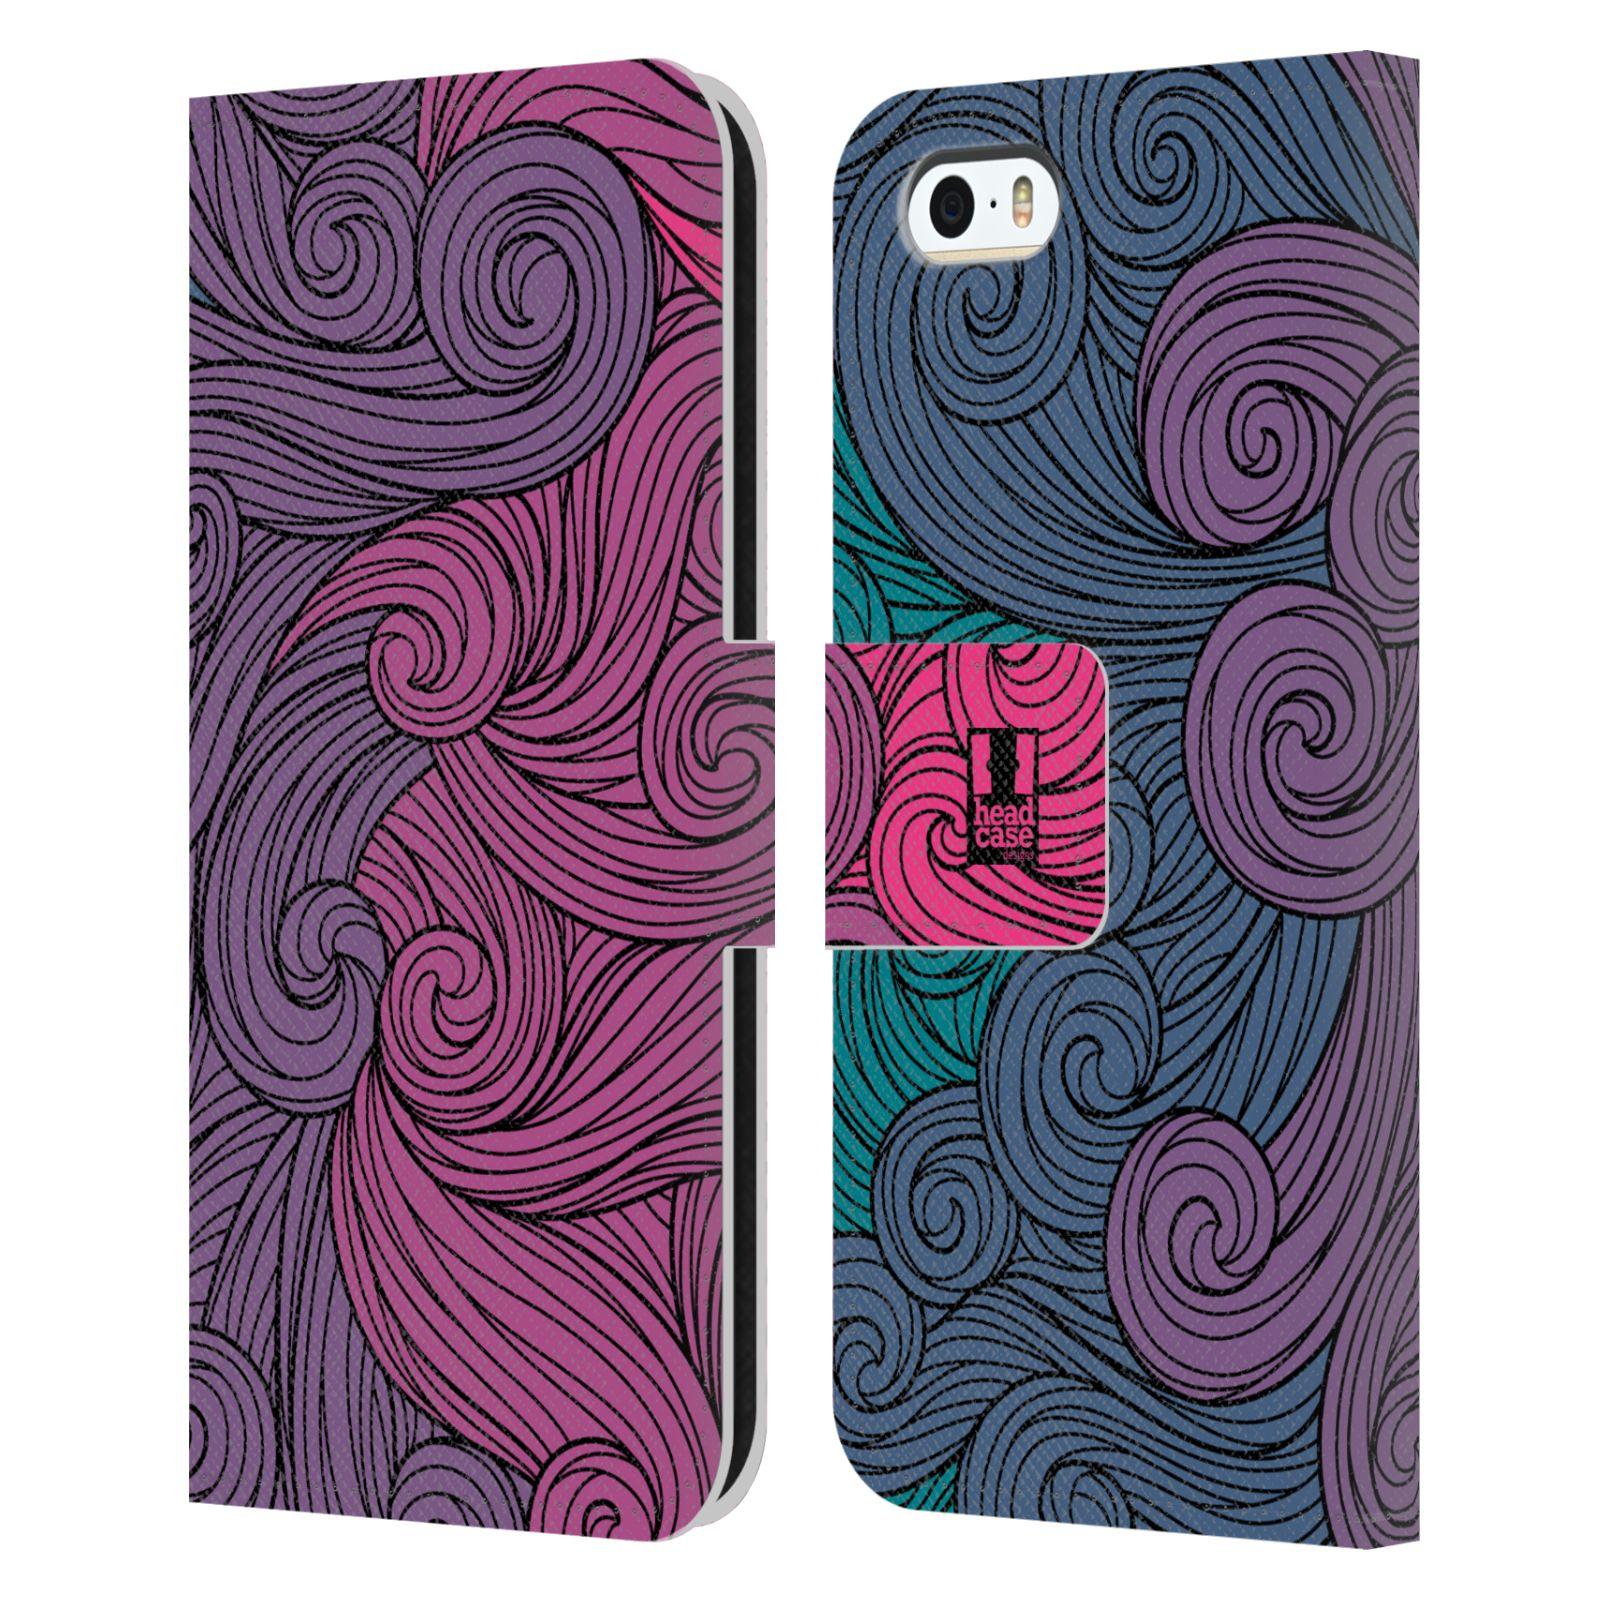 HEAD CASE Flipové pouzdro pro mobil Apple Iphone 5/5s barevné vlny růžová a modrá